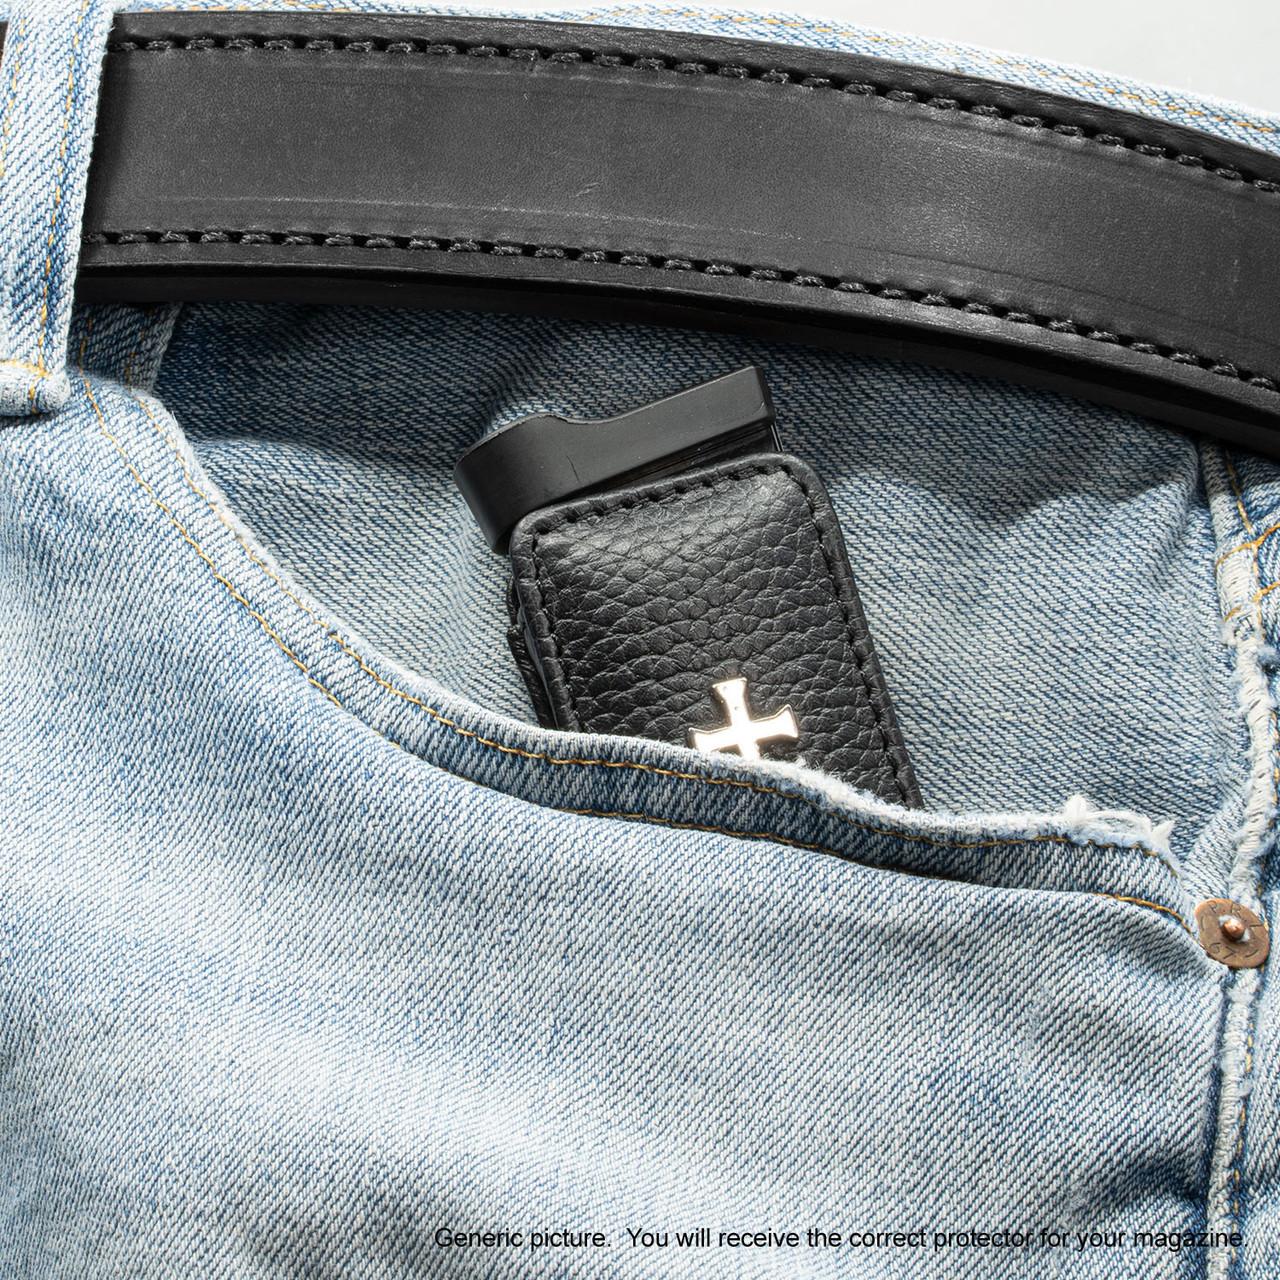 Kahr S9 Black Leather Cross Magazine Pocket Protector